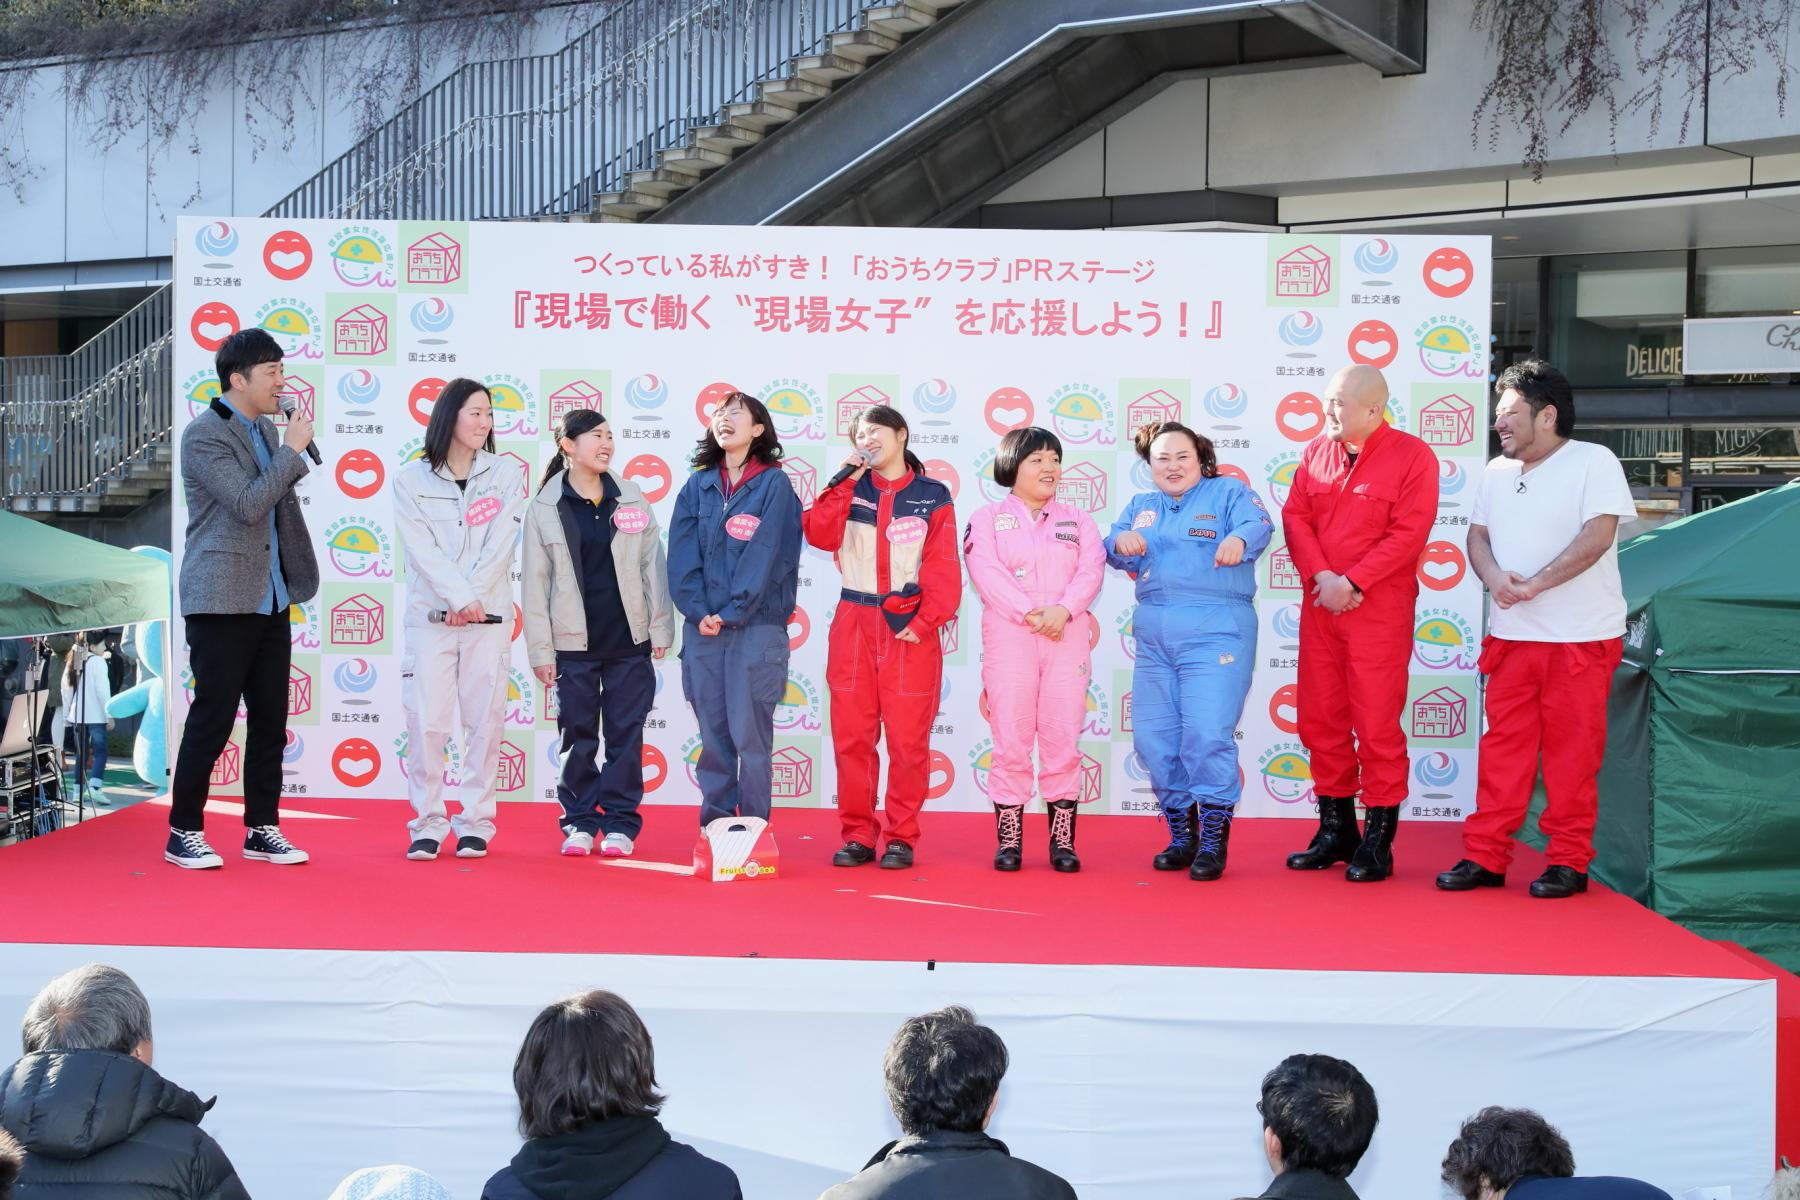 http://news.yoshimoto.co.jp/20170226100303-02ea1fe97d4a2b26454ab08549f38280fadd32f5.jpg